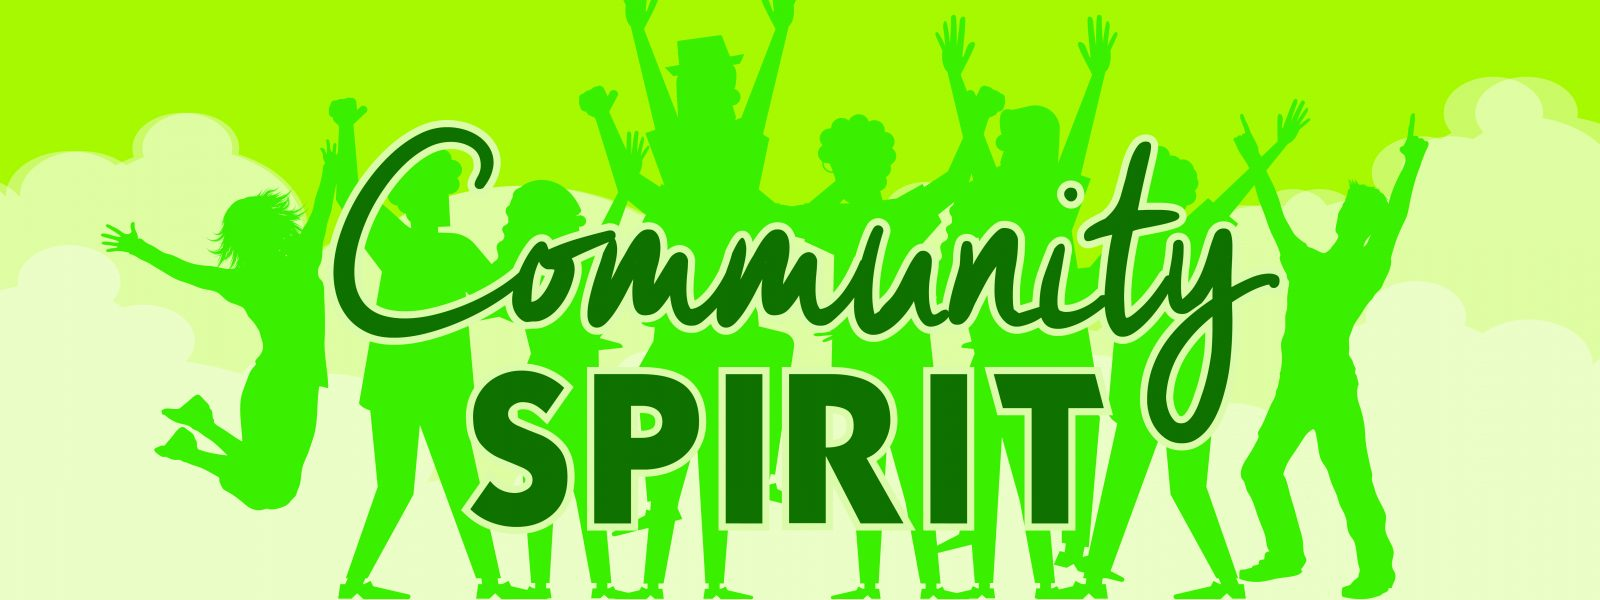 Community Spirit in Milngavie